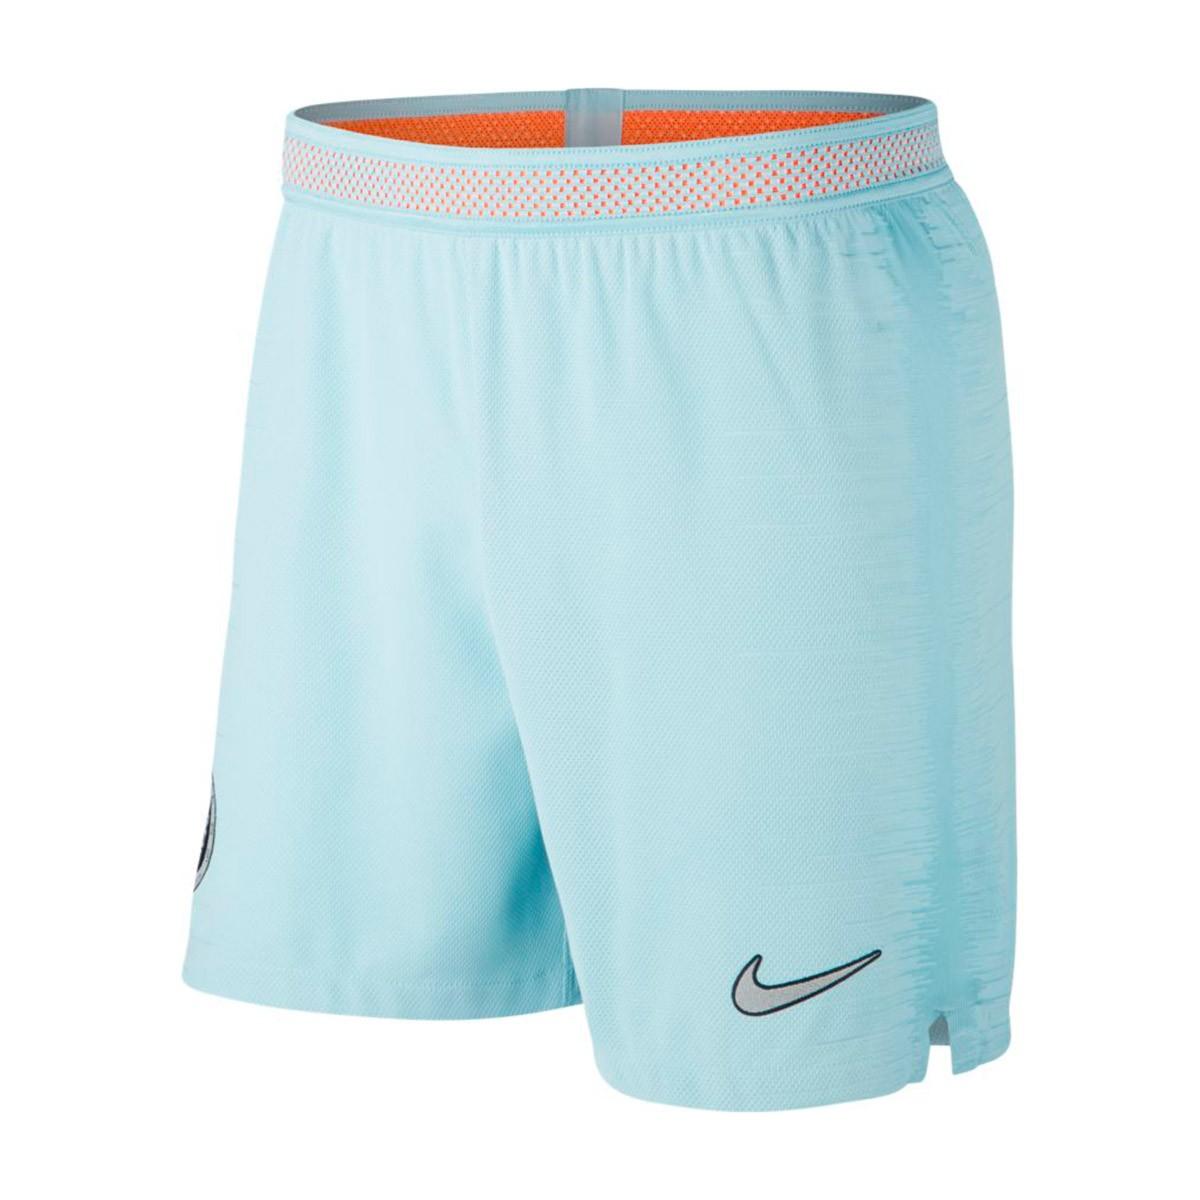 8a3fb390cc3c Shorts Nike Vapor Chelsea FC Match 2018-2019 Third Ocean bliss ...